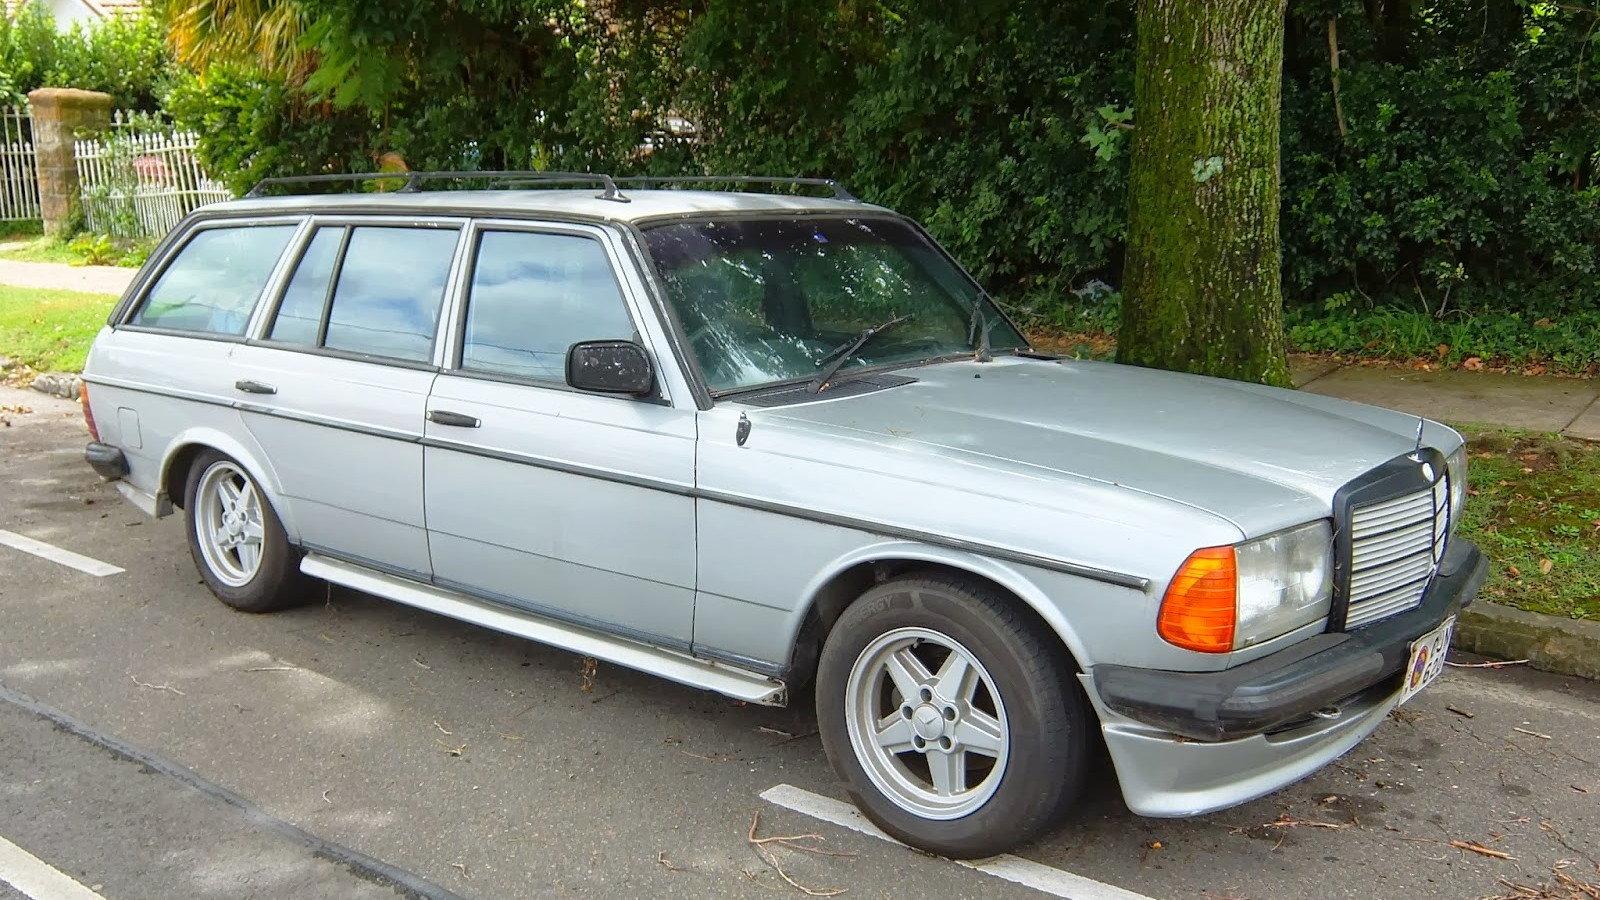 Mercedes-Benz W123 280TE AMG Wagon